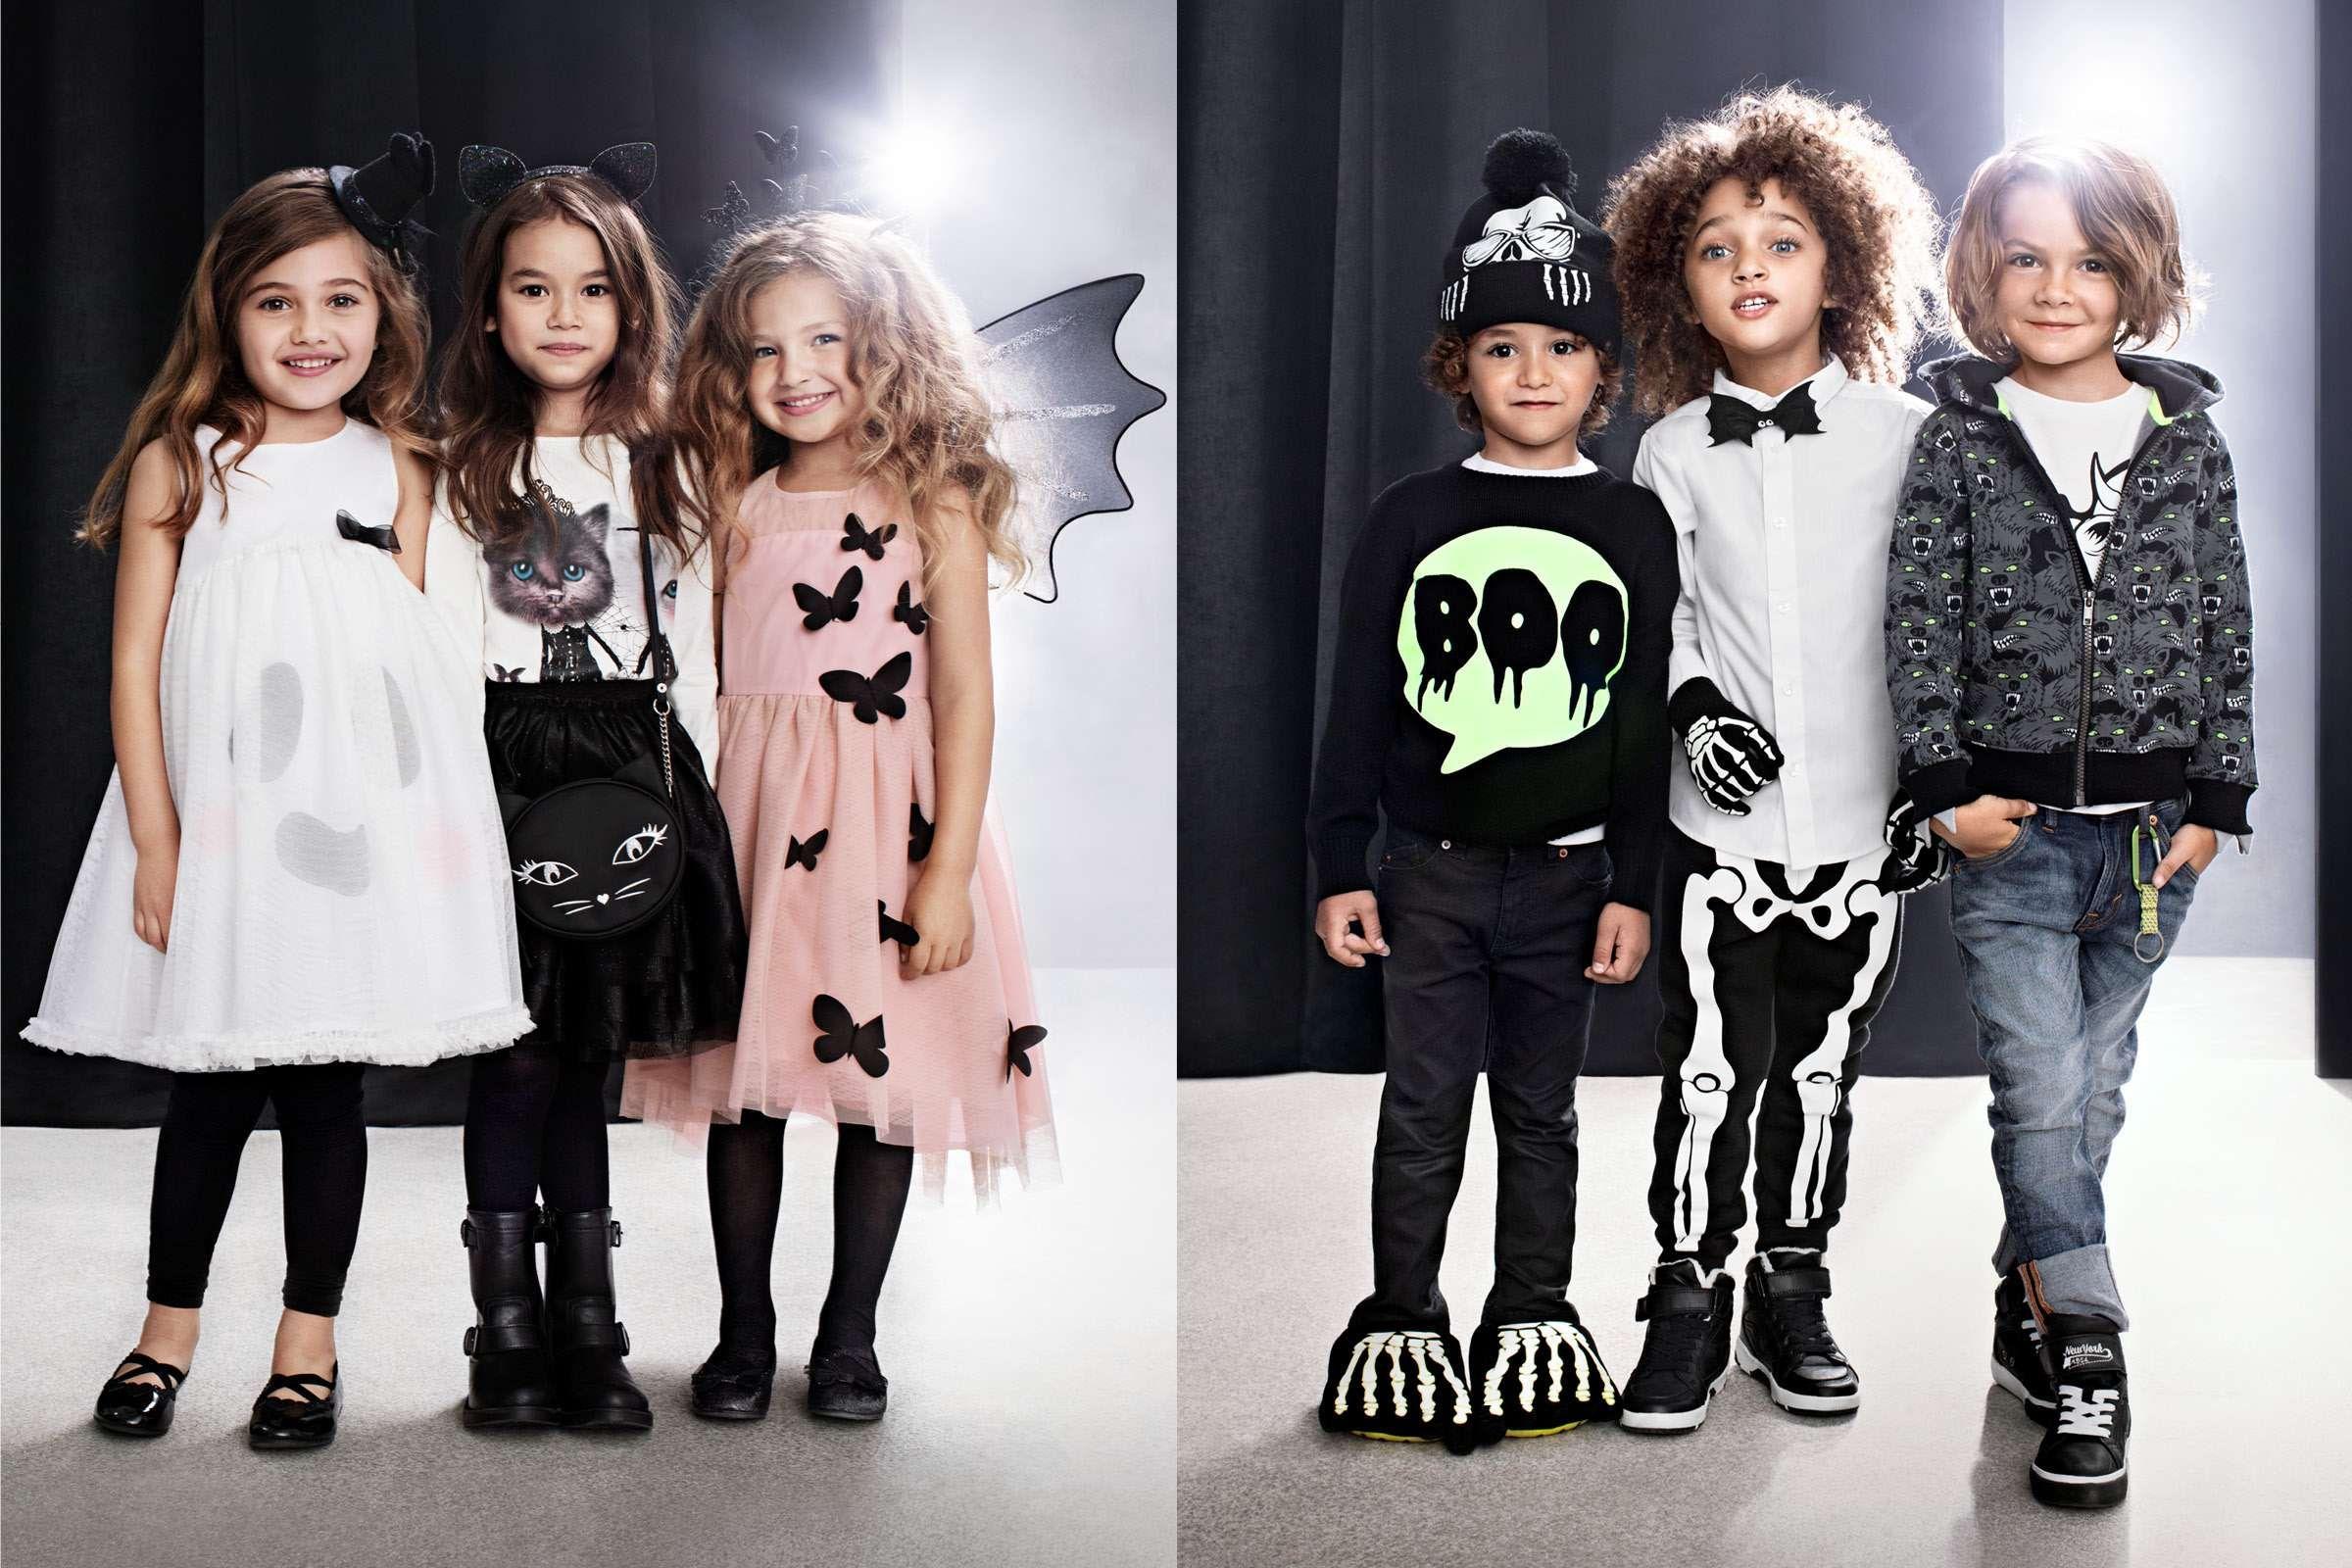 Hm Halloween.Fashion Halloween H M Hr Outfit Kids Fashion